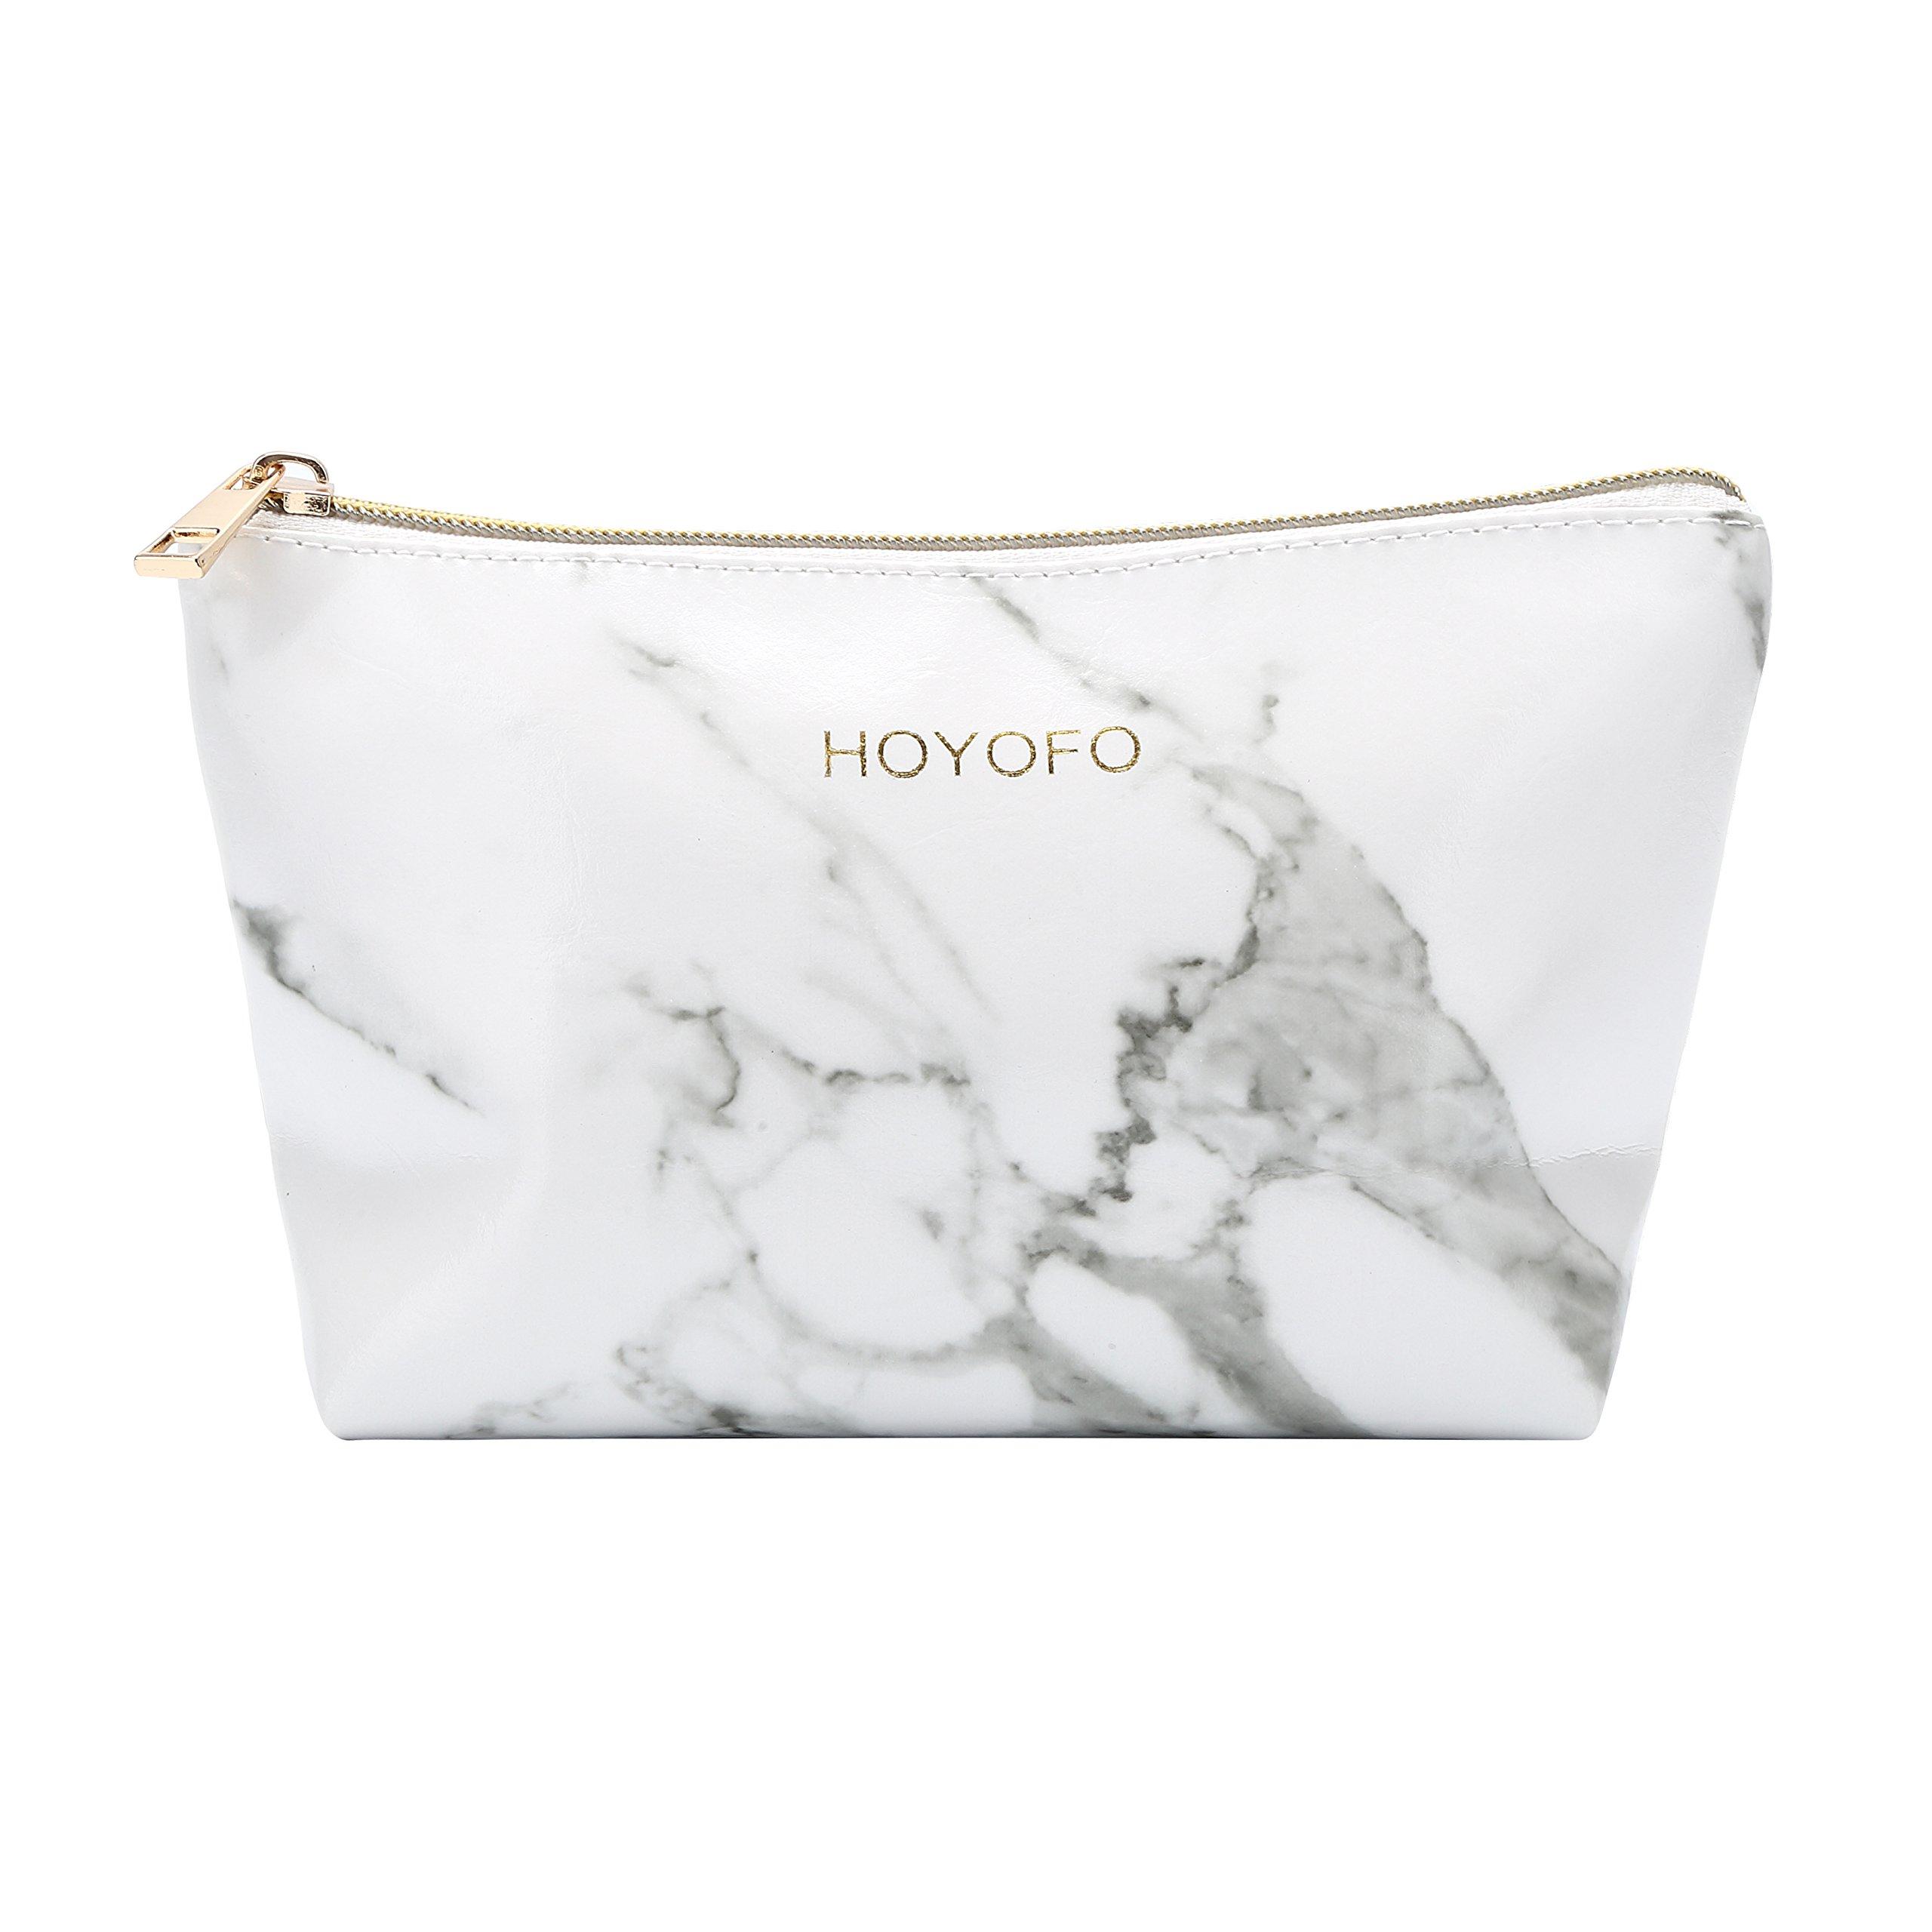 d7d73e5559a Amazon.com : HOYOFO Cosmetic Pouch for Women Travel Makeup Bags ...